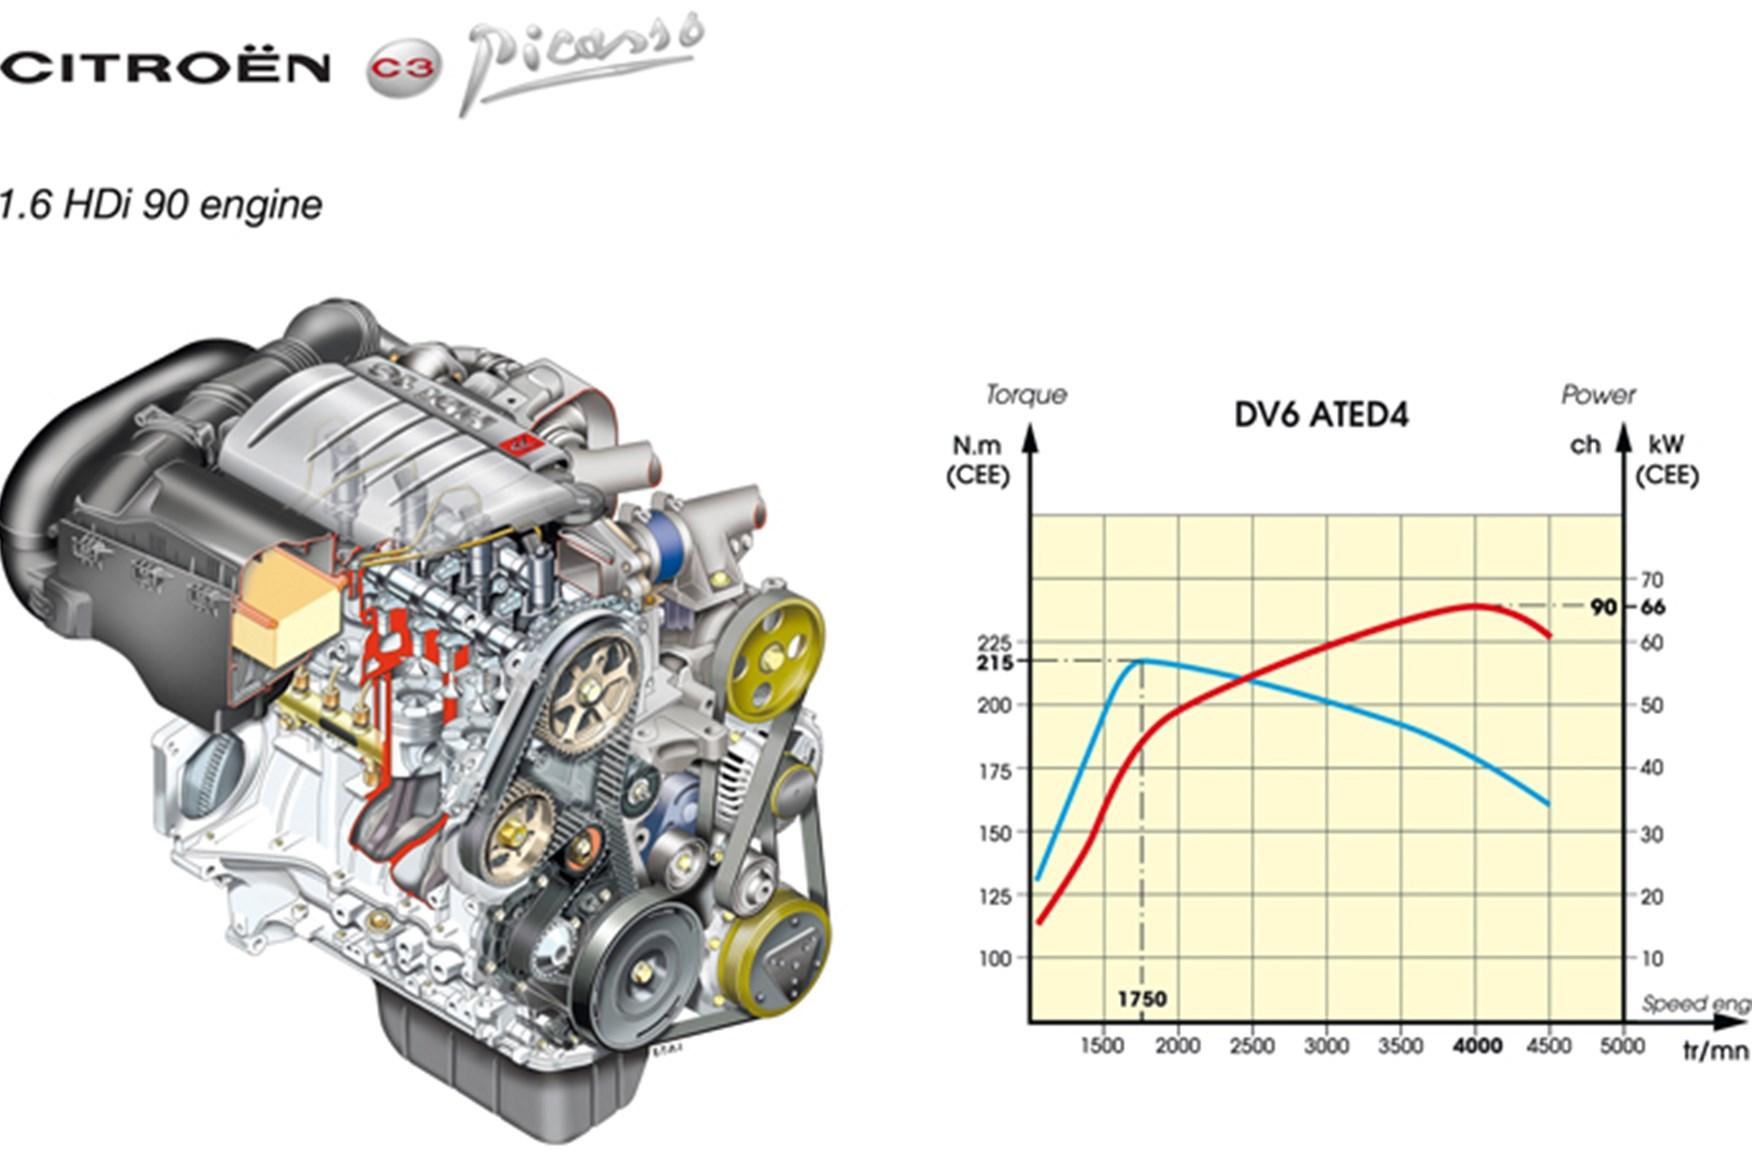 citro n c3 picasso 1 6 hdi long term test review car magazine rh carmagazine co uk citroen relay engine diagram citroen c2 engine diagram